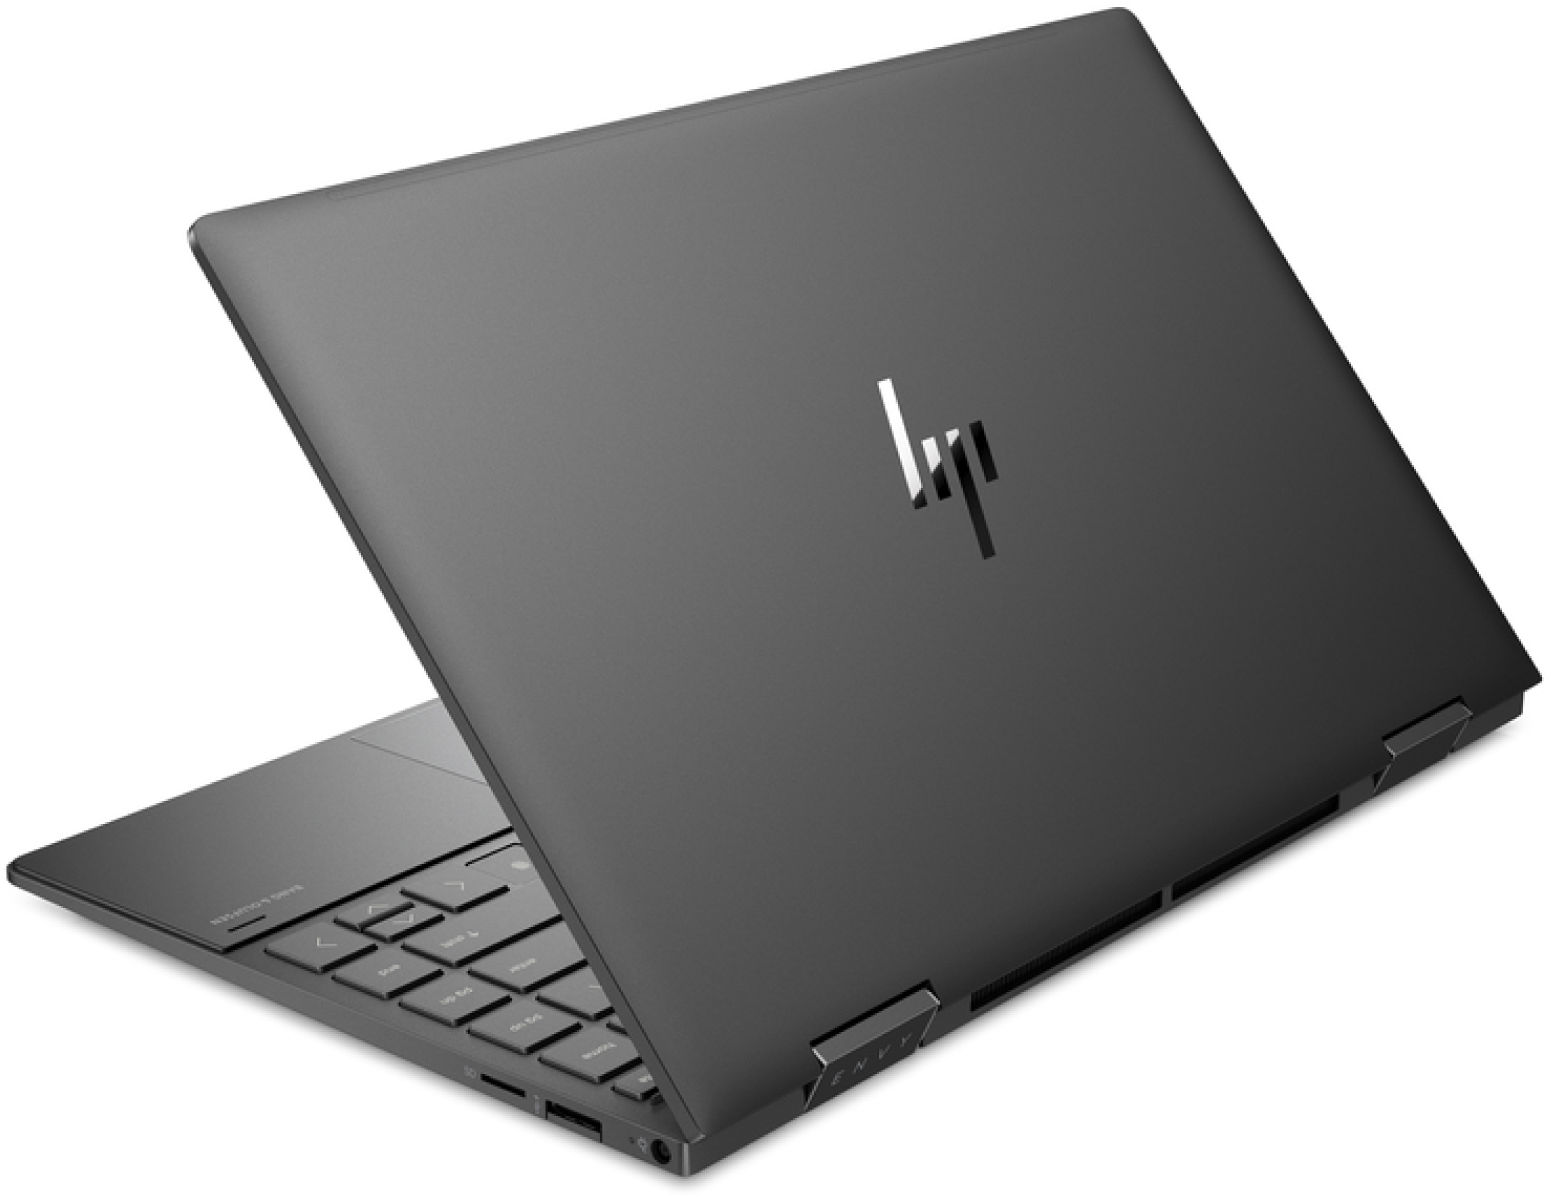 Laptop HP Envy x360 13-ay0008na 2S897EAR